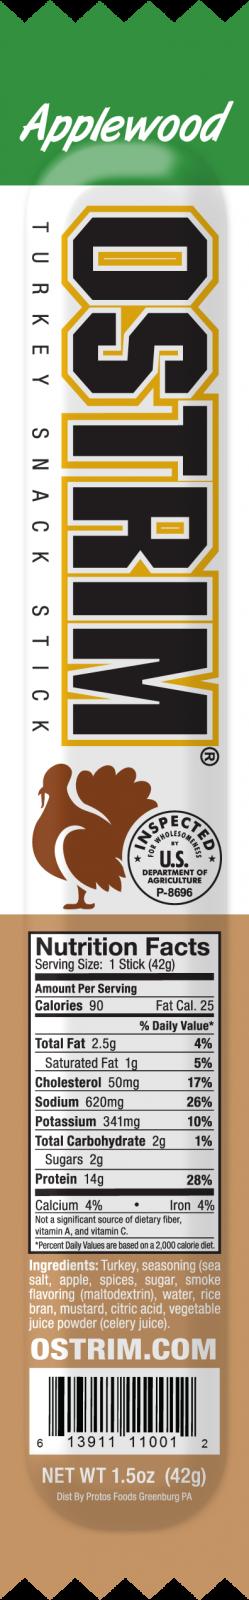 OSTRIM Turkey Snack (1 Stick)